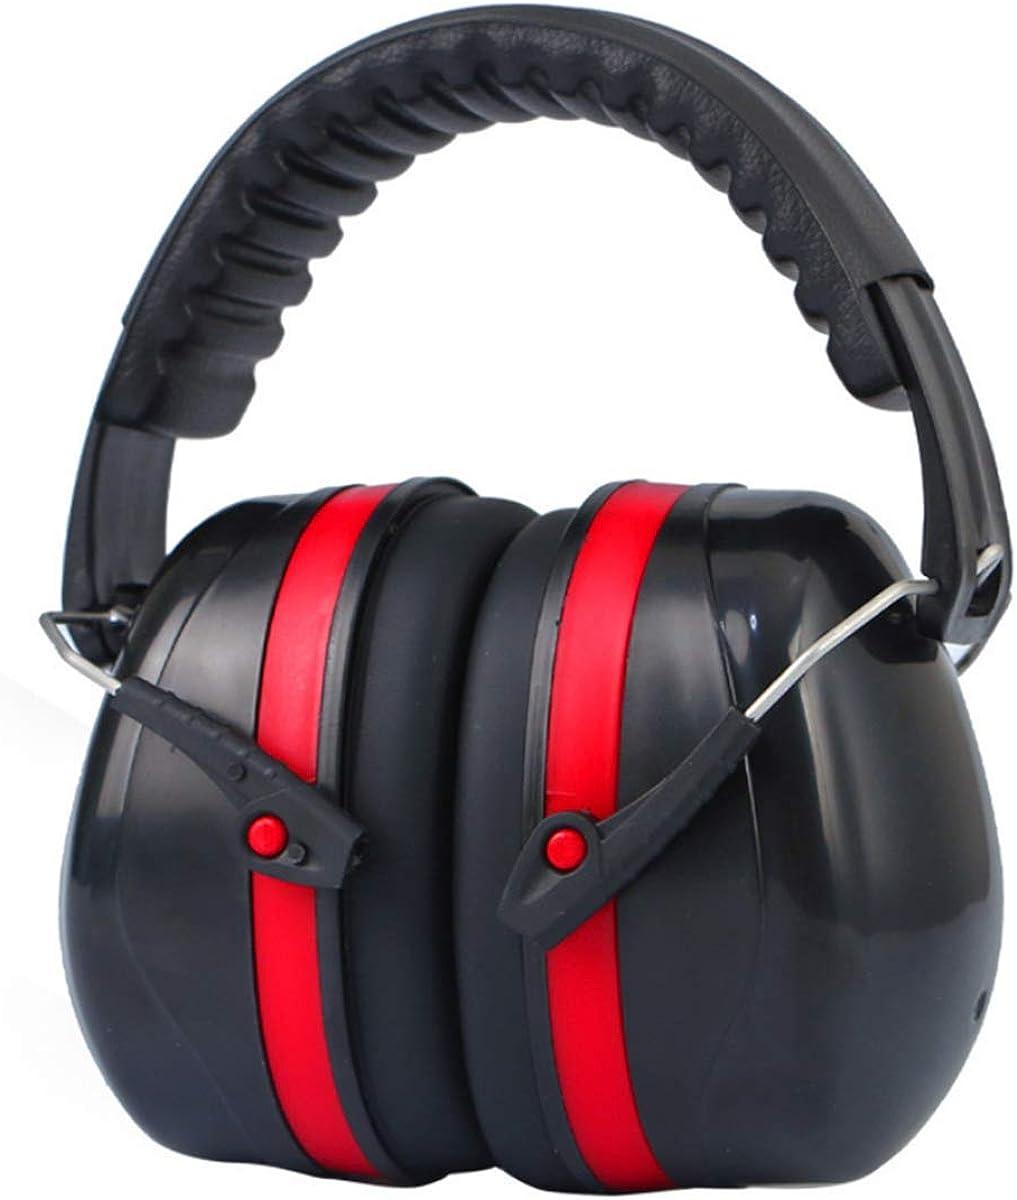 HIUHIU Tactical Earmuffs Noise Reduction Work Headphones San Francisco Mall Learnin All items free shipping